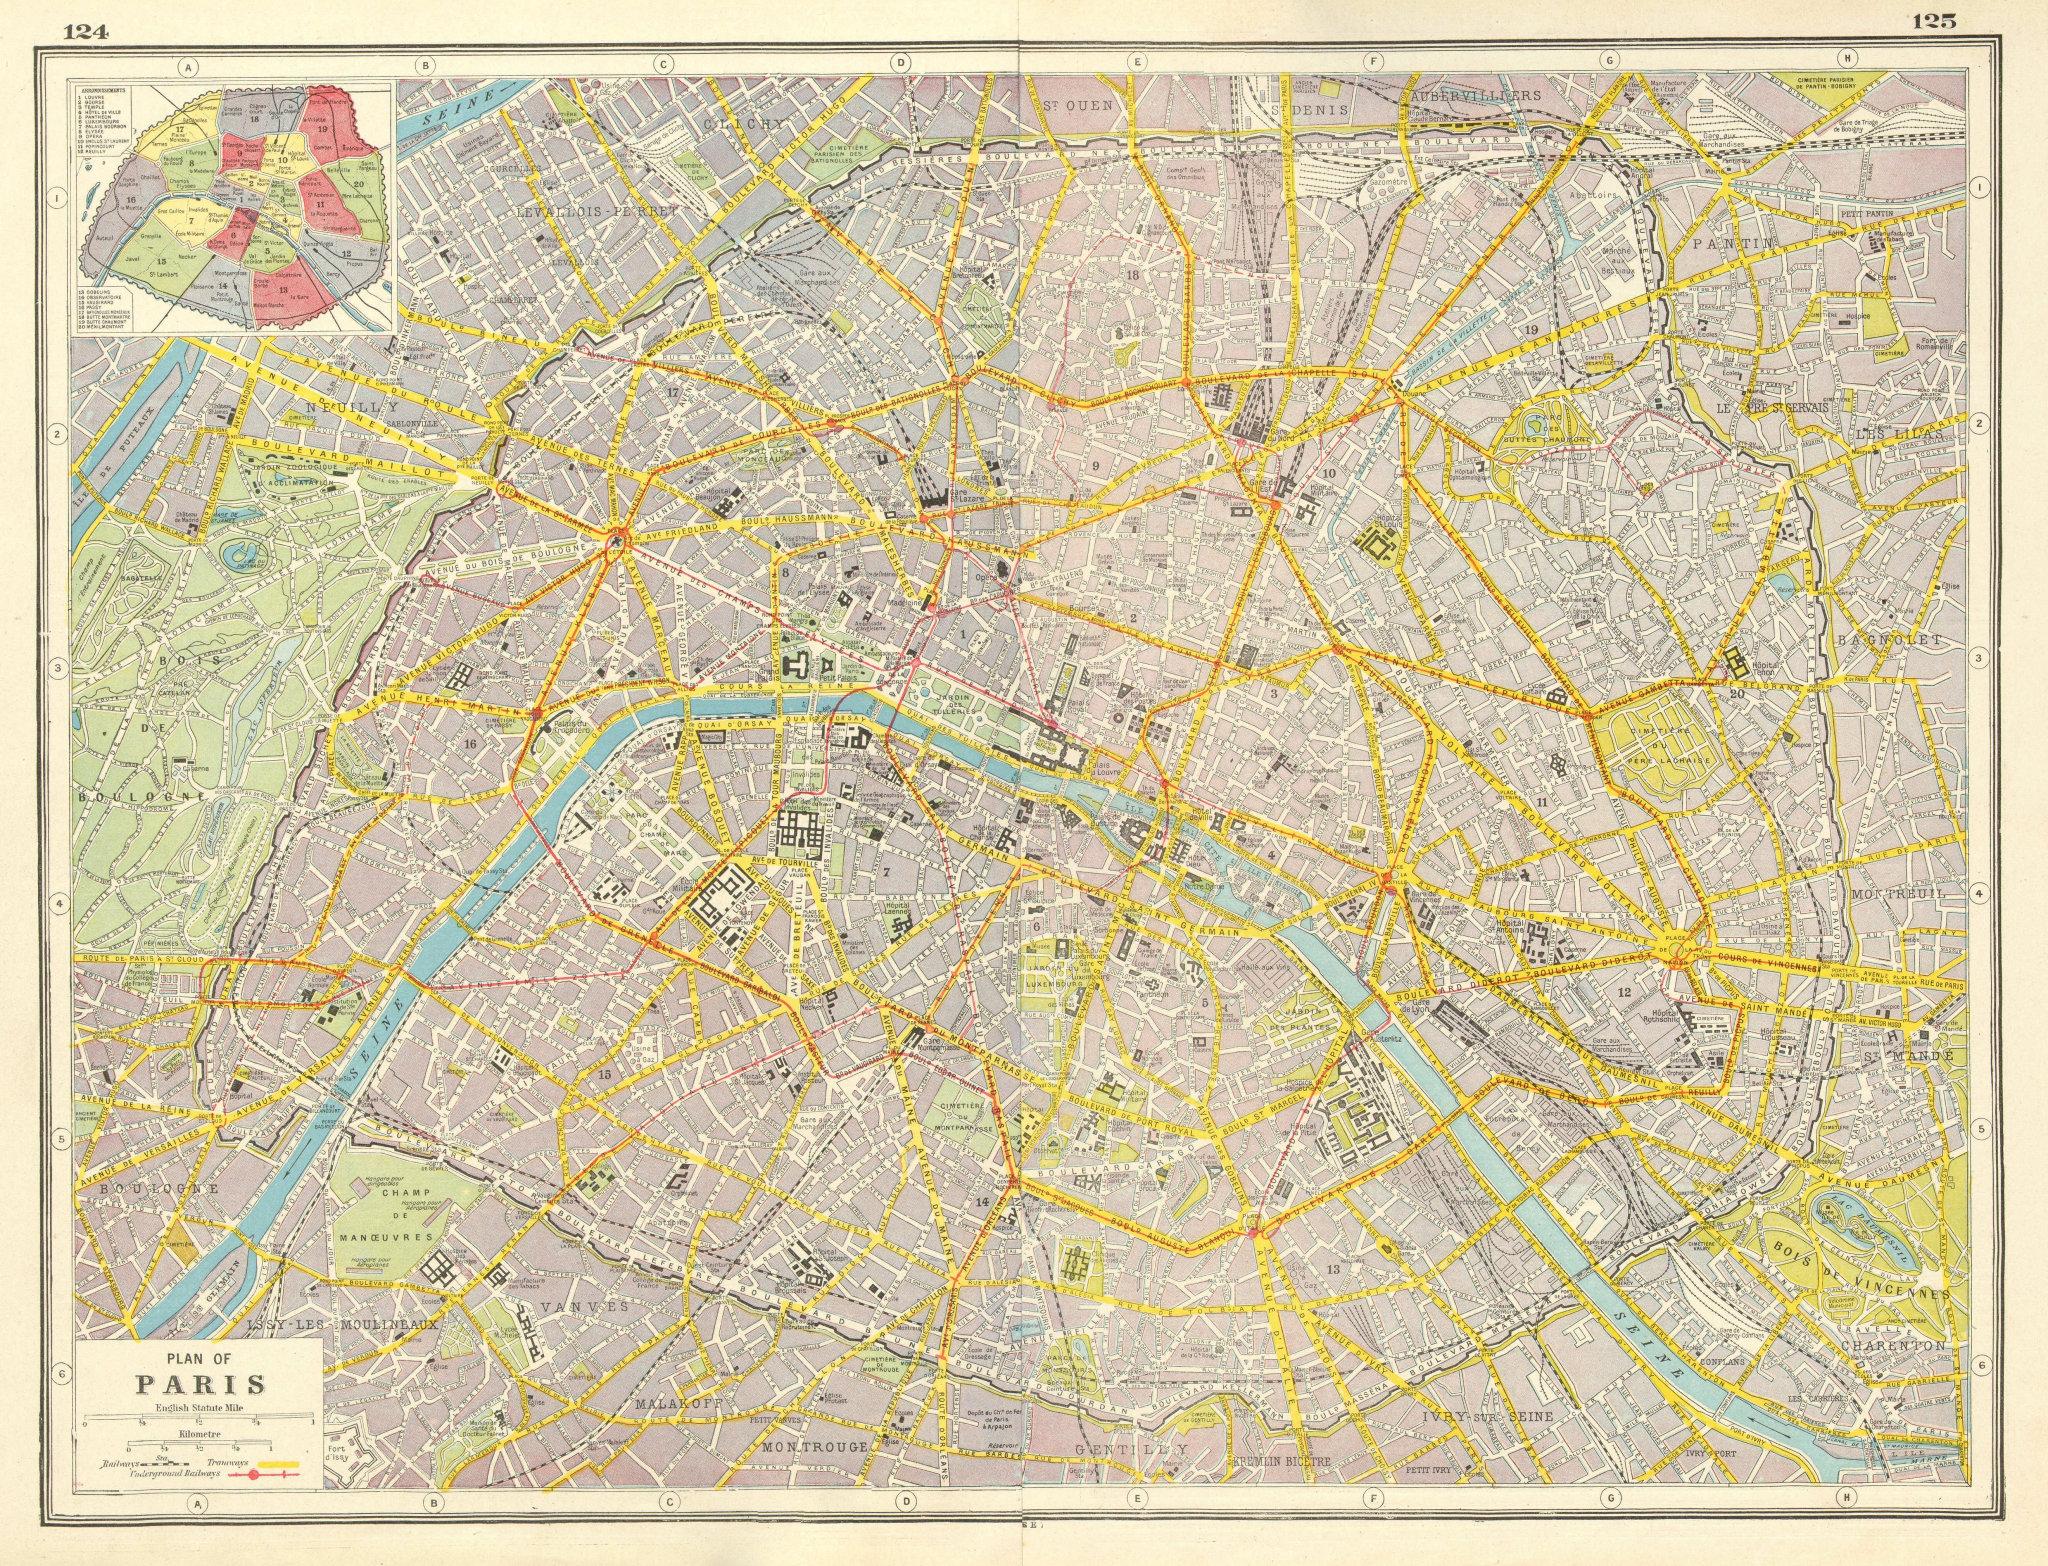 Associate Product PARIS CITY PLAN. tramways railways fortifications Arrondissements 1920 old map